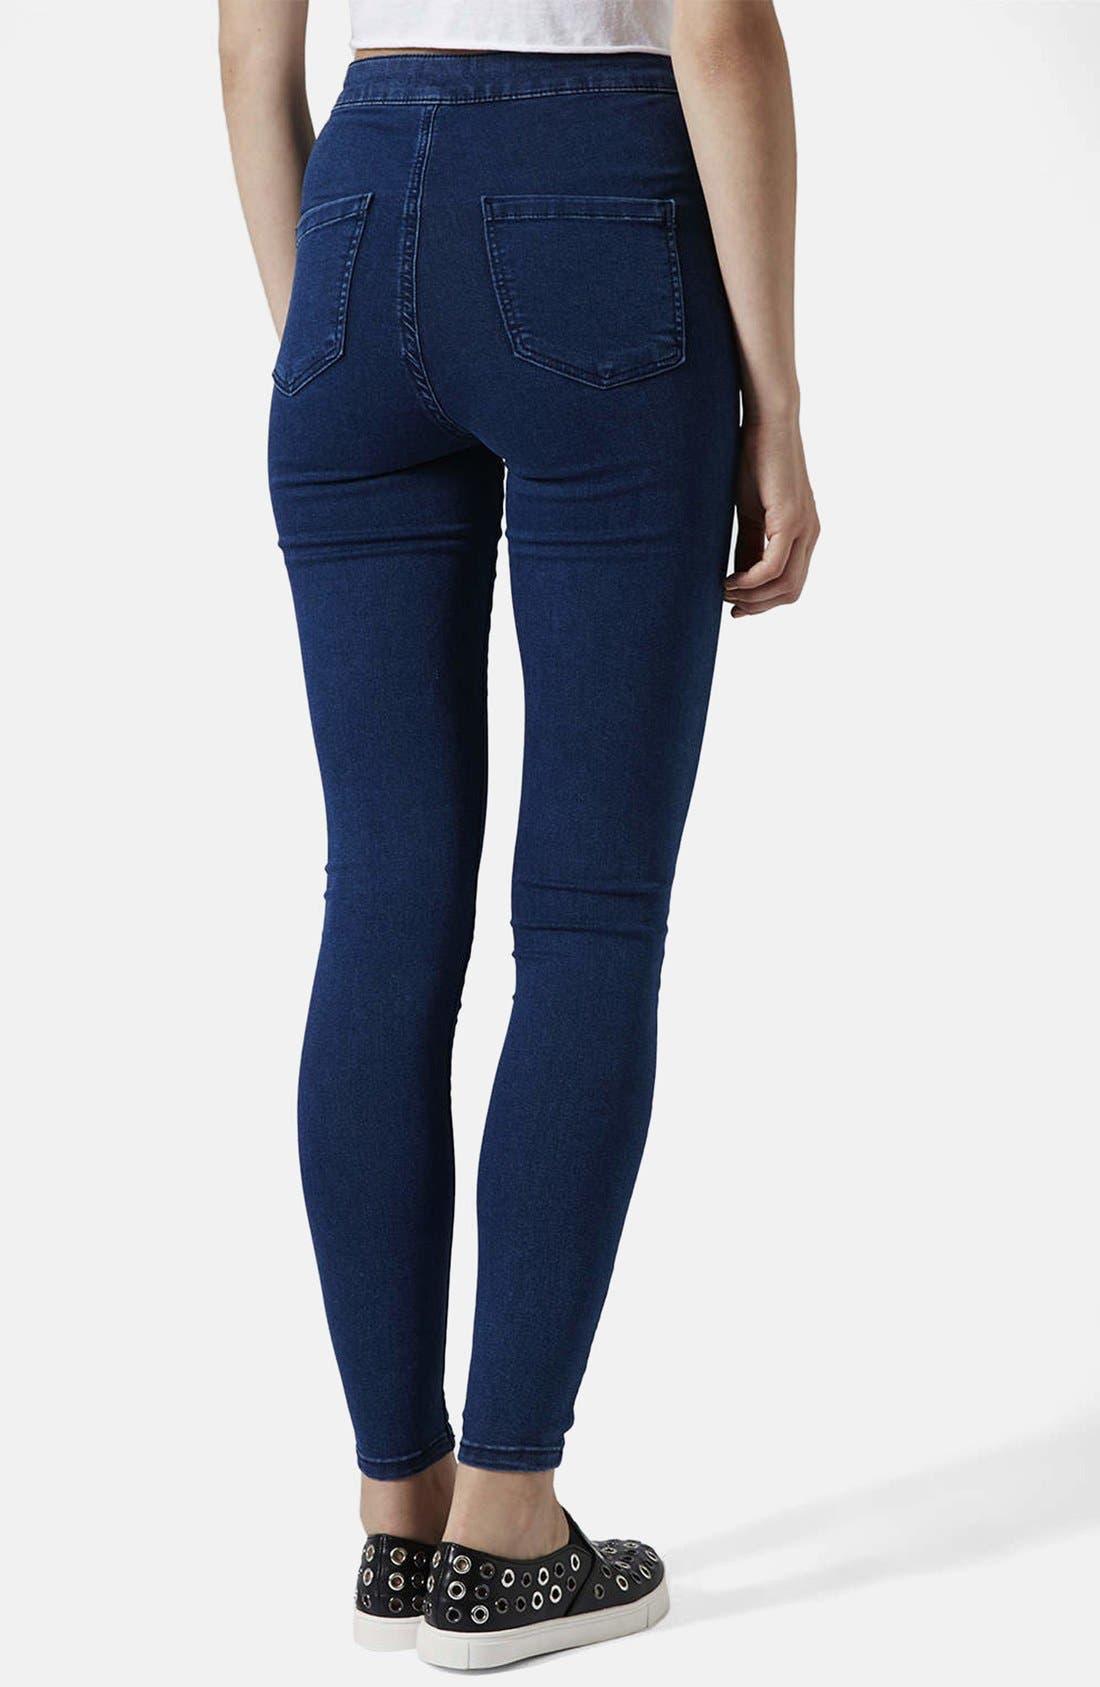 Alternate Image 2  - Topshop Moto 'Joni' Skinny Jeans (Dark Stone) (Short)